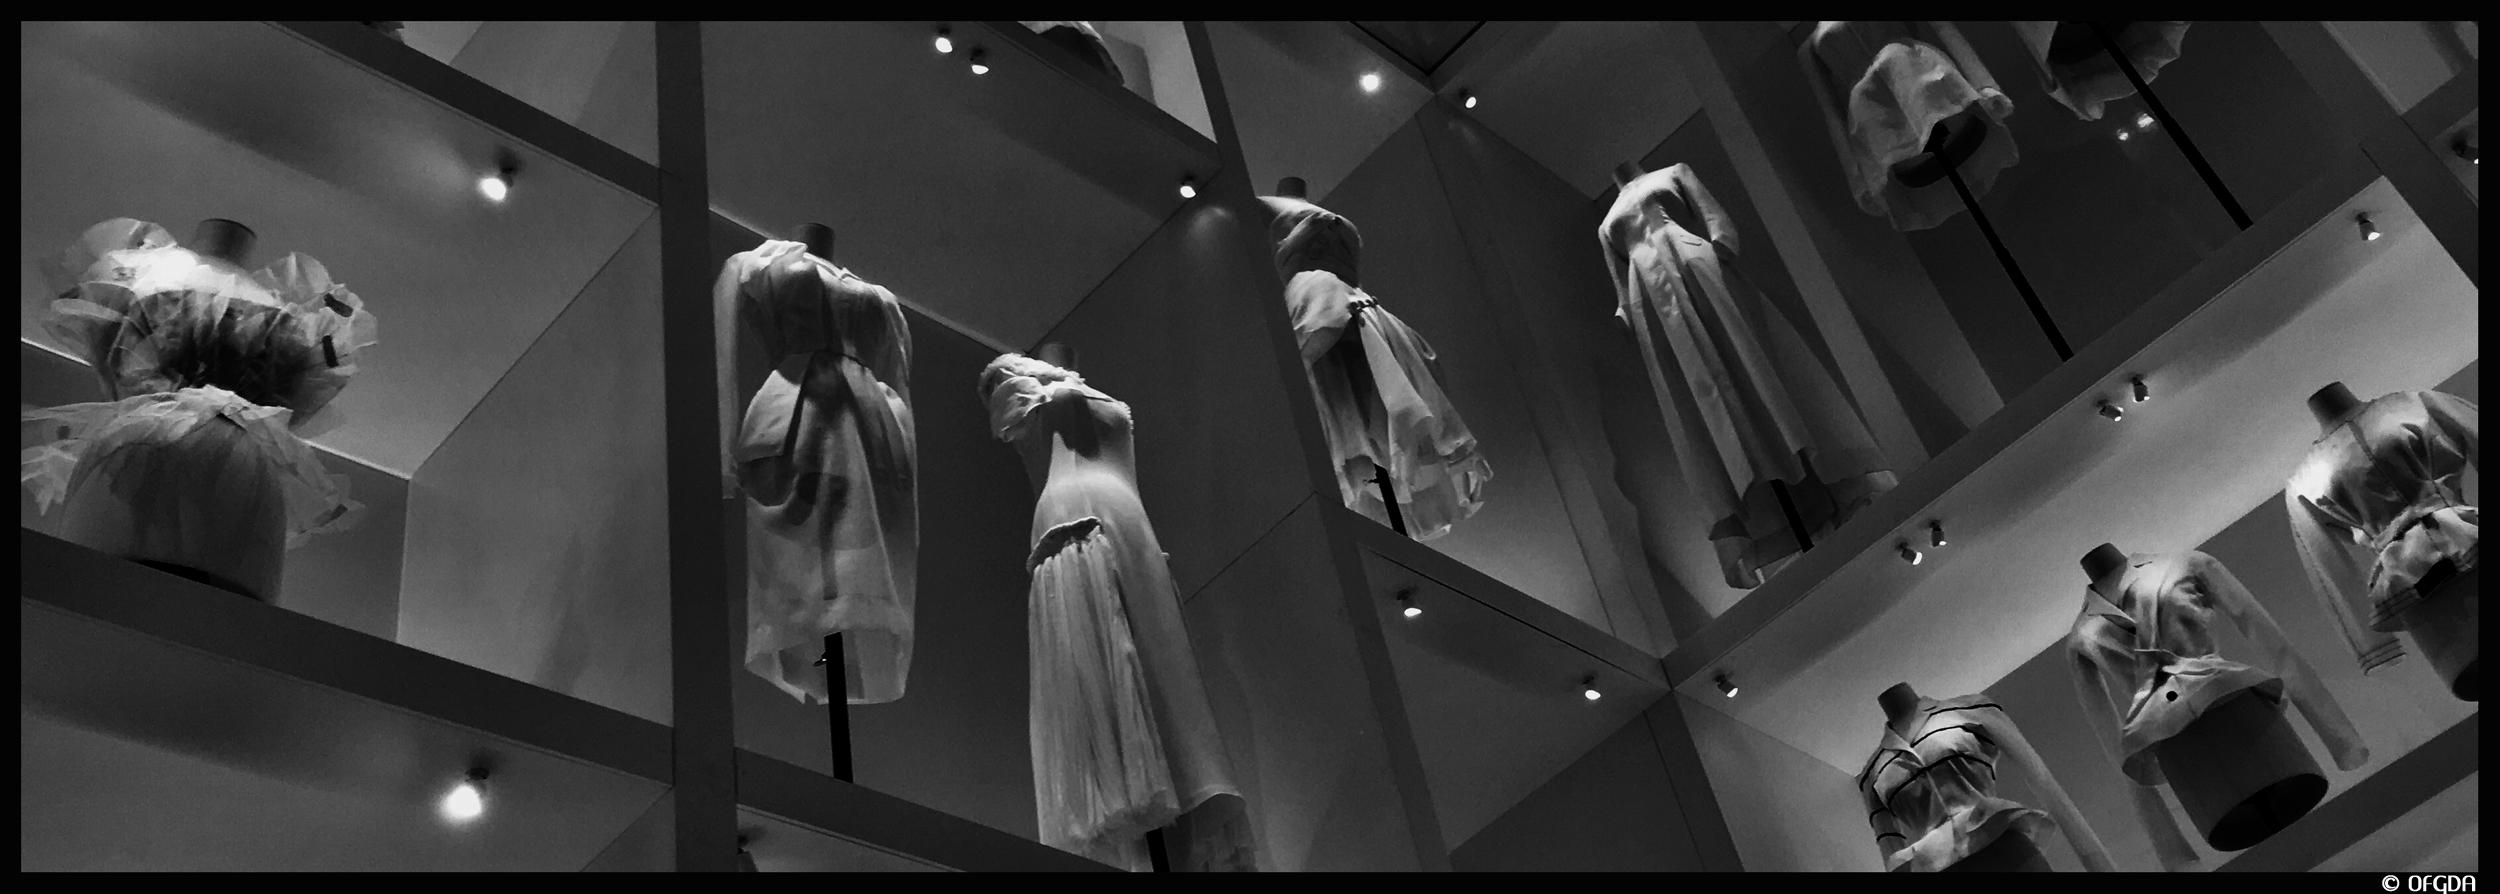 COuv_Expo_Dior_1_©OFGDA_@loeilodliv